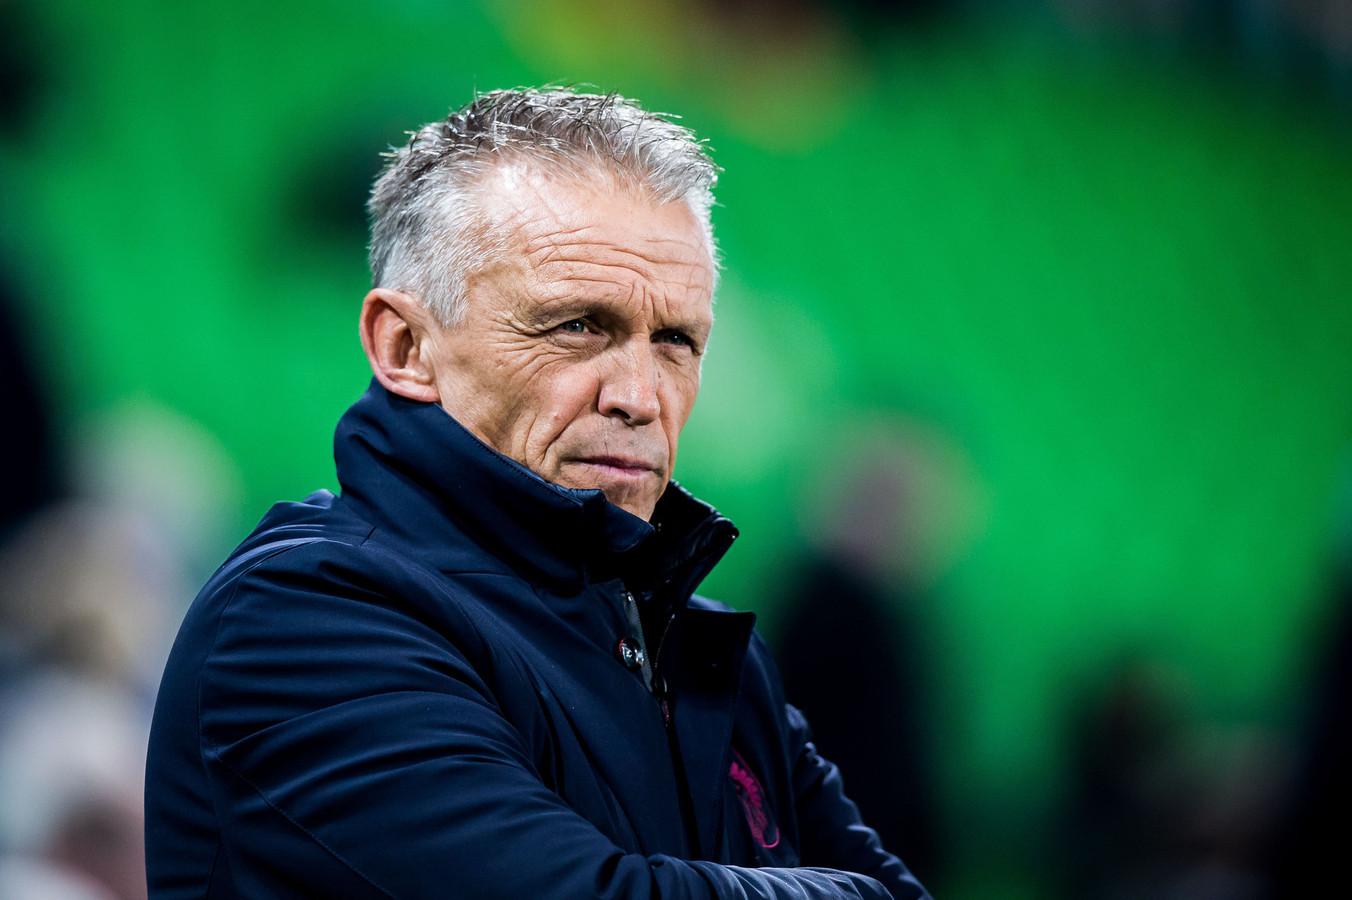 Edward Sturing zwaait af als interim bij Vitesse. De Arnhemse club zoekt een andere trainer.